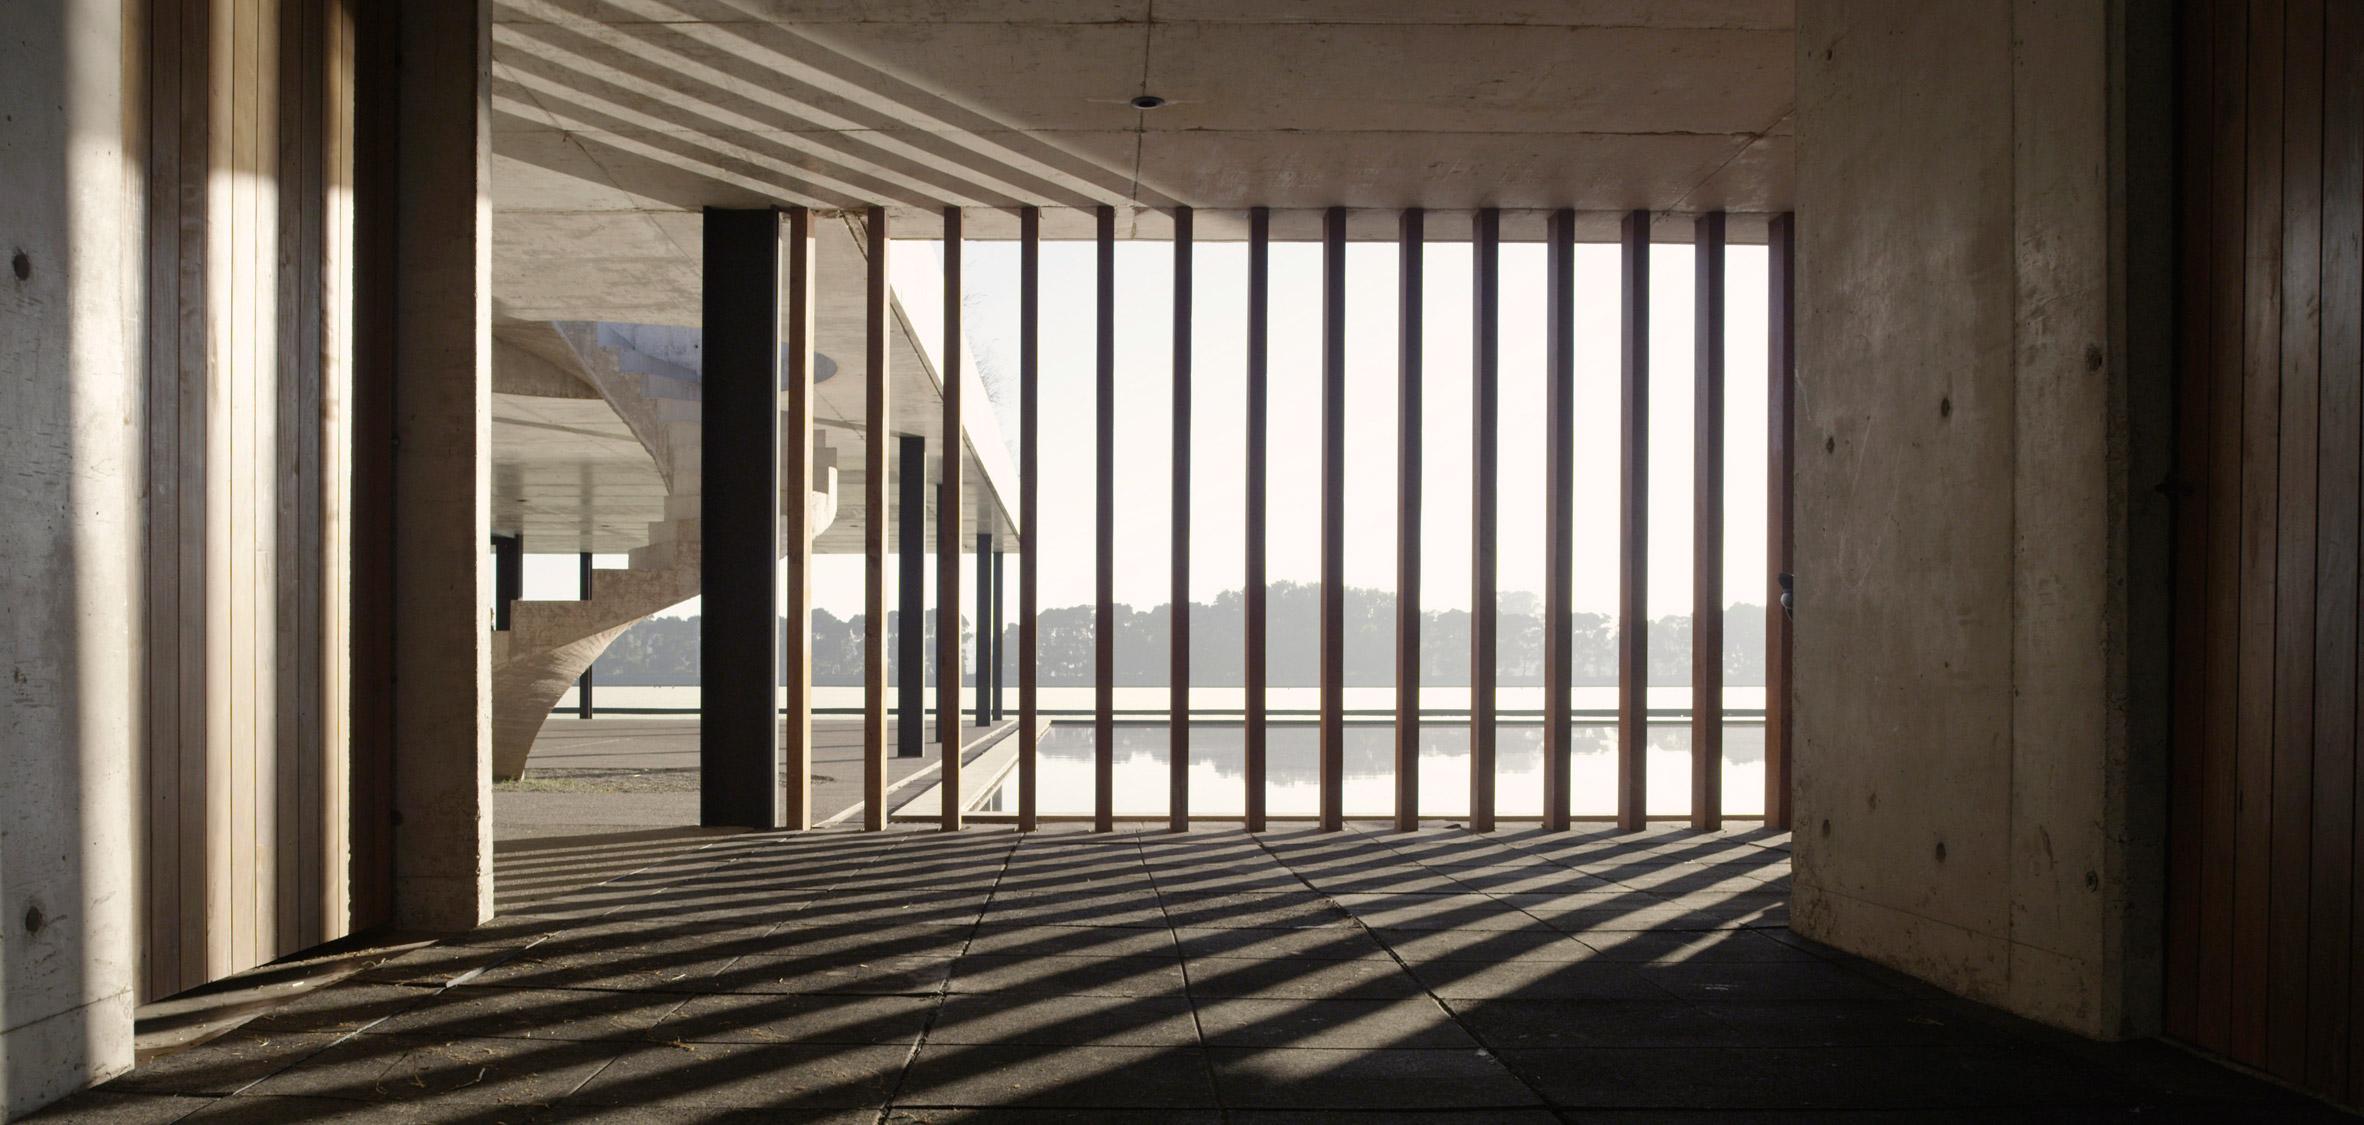 figueras-polo-stables-estudio-ramos-architecture-public-and-leisure_dezeen_2364_col_17.jpg